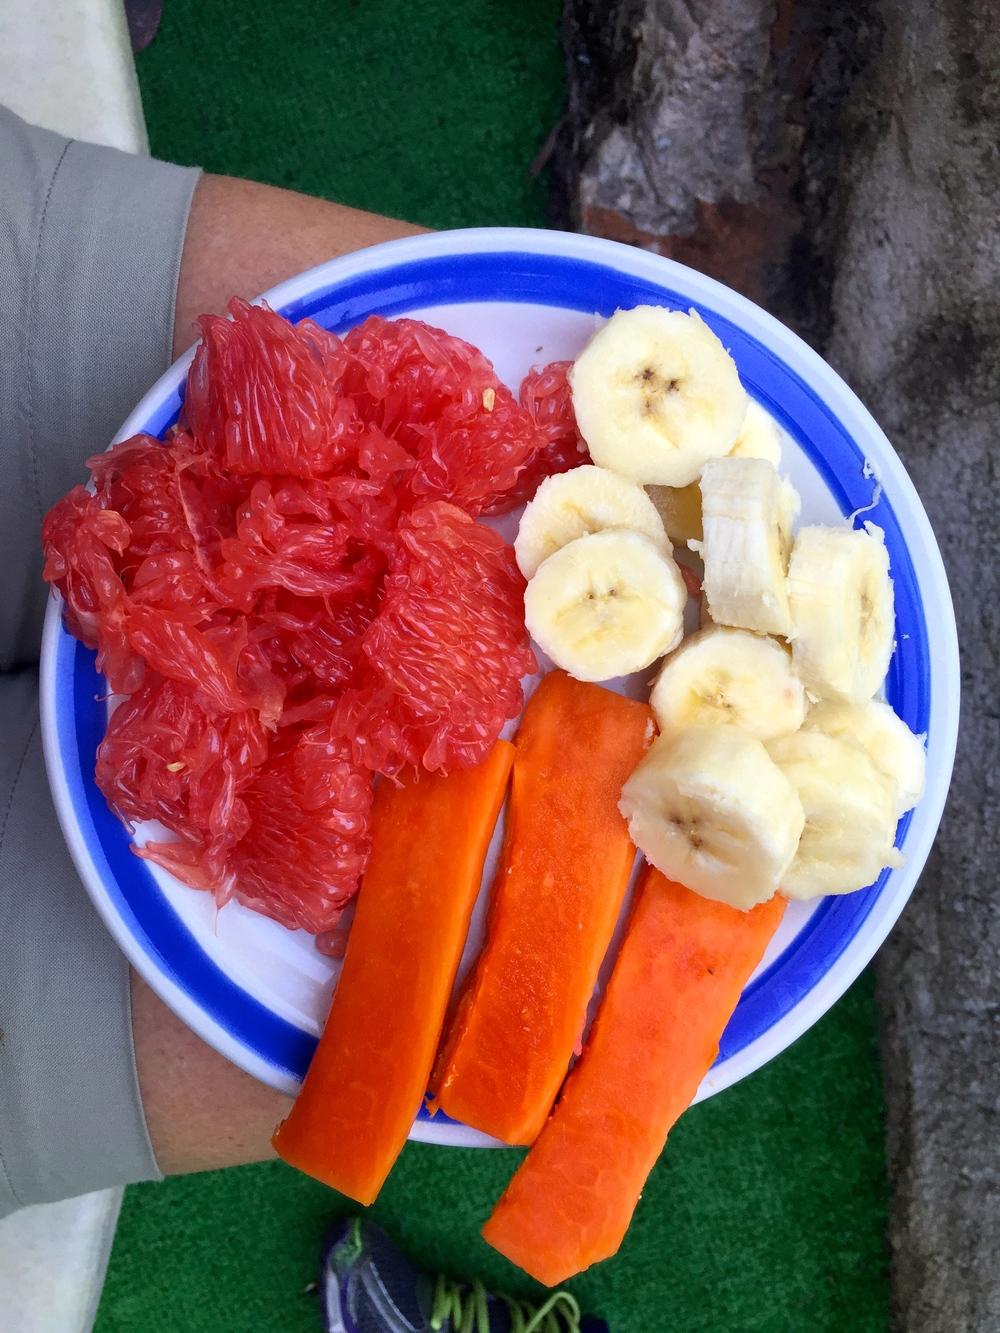 Grapefruit, Papaya, Banana...YUM!